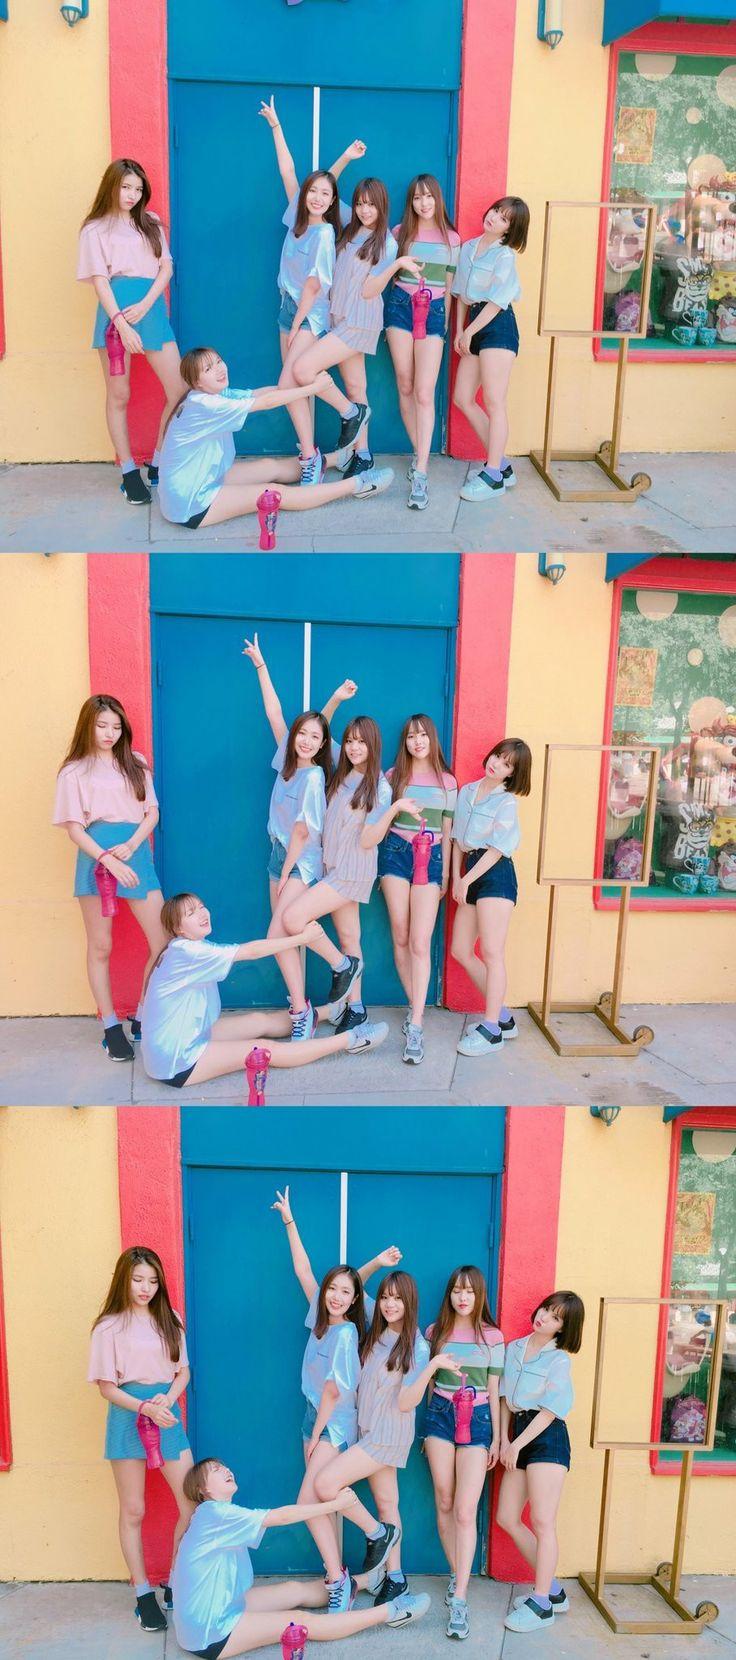 Gfriend Update Fancafe! Ready for comeback?